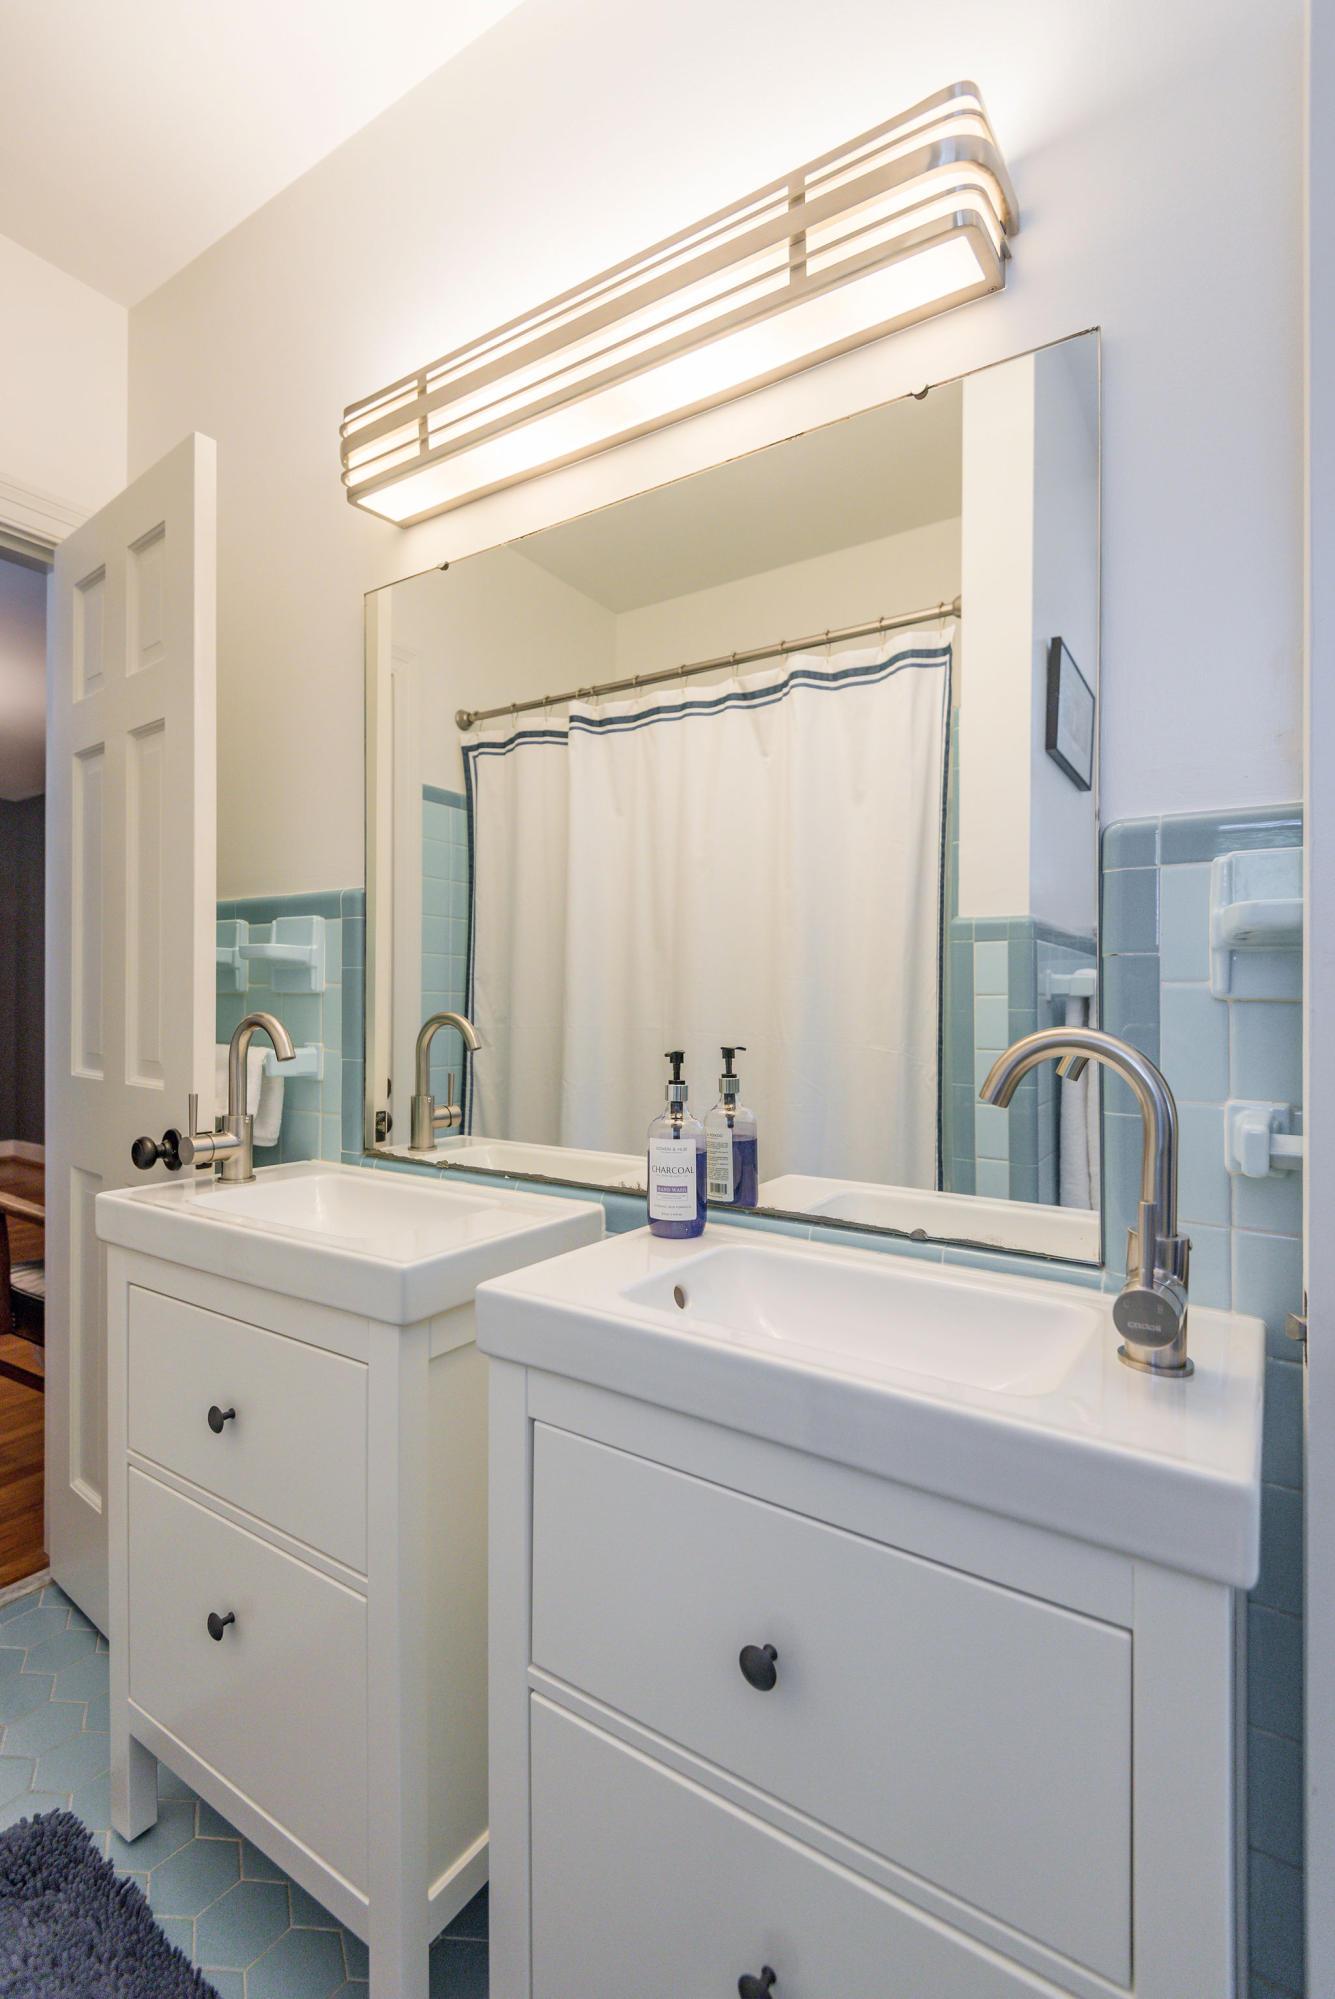 Sylvan Shores Homes For Sale - 450 Polony, Charleston, SC - 23